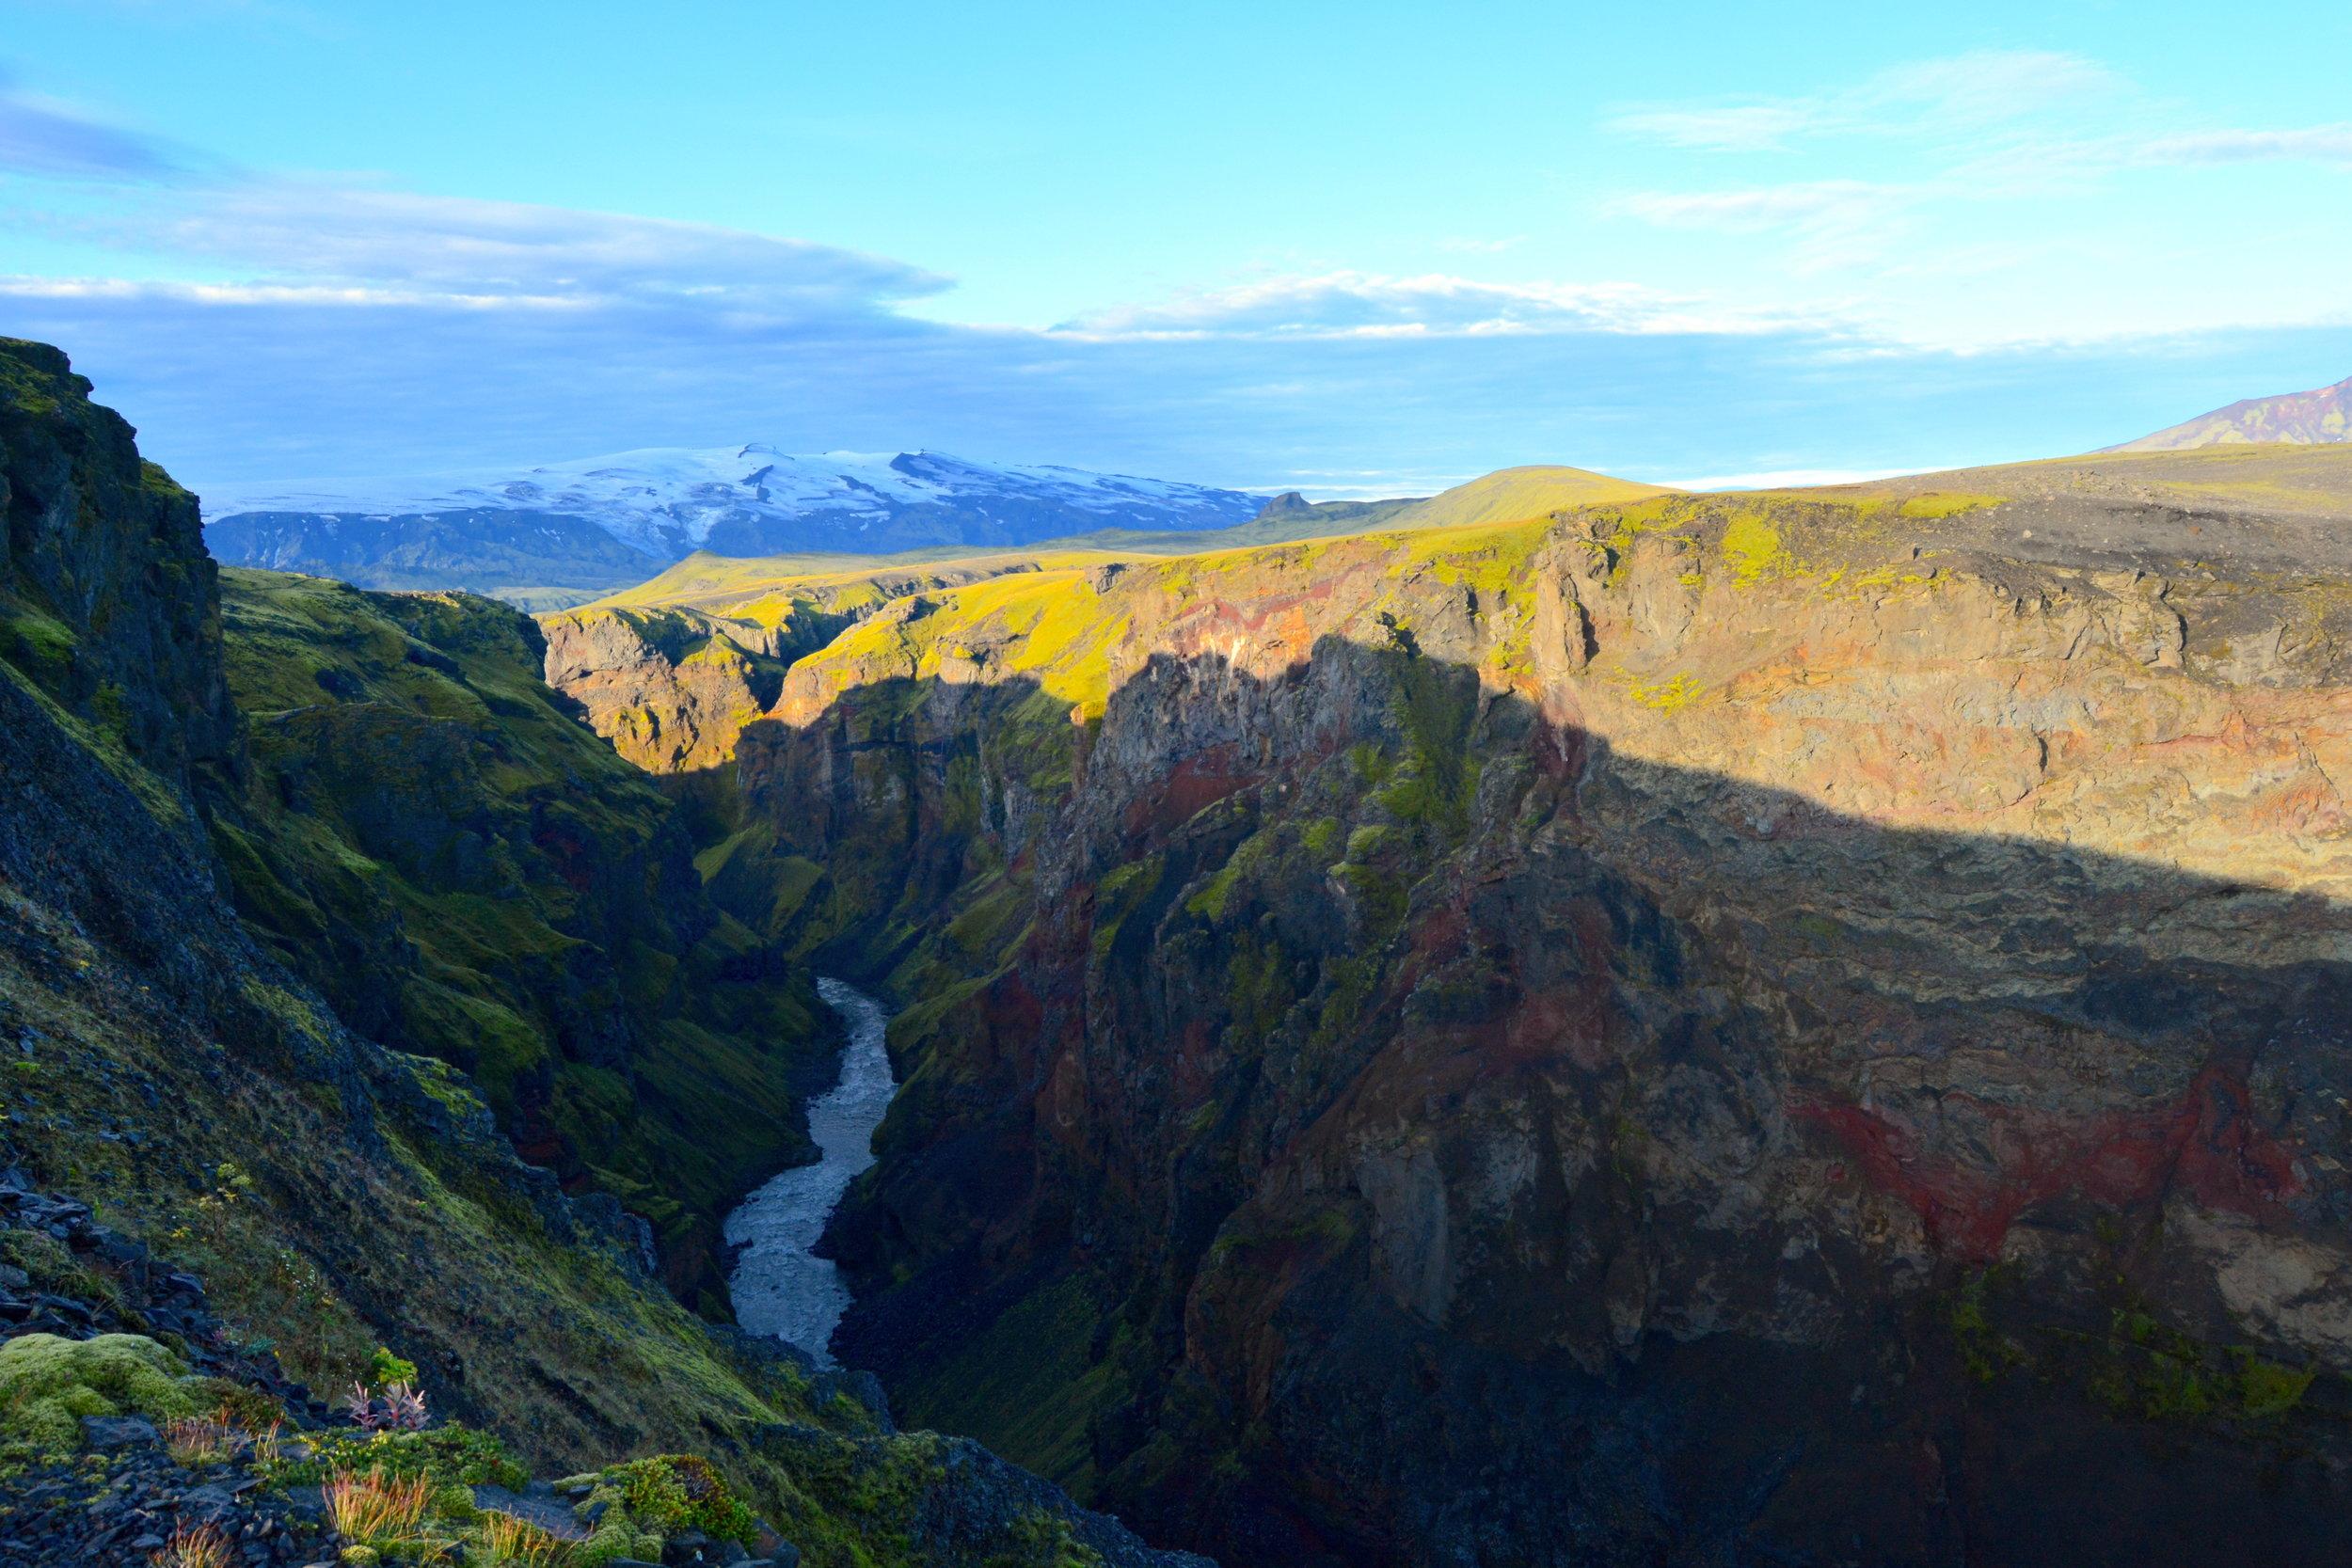 A beautiful, multi-colored gorge near Emstrur